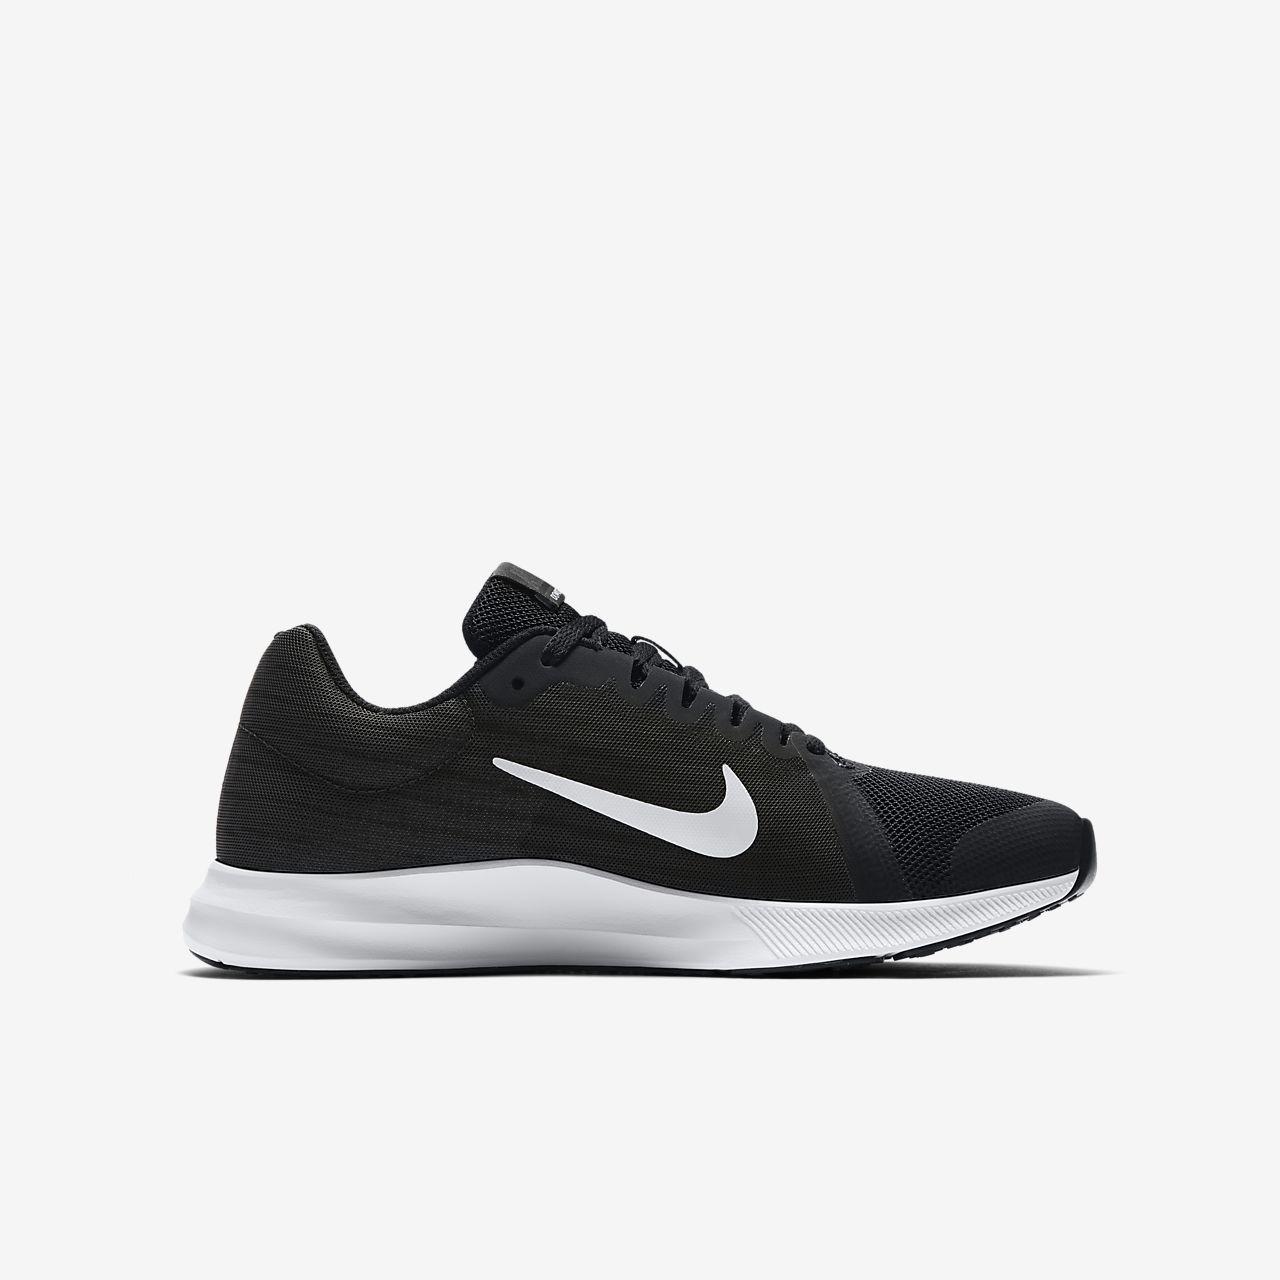 Nike - Wmns Nike Downshifter 8 - En Cours D'exécution Schoen Femmes nvJv9nm